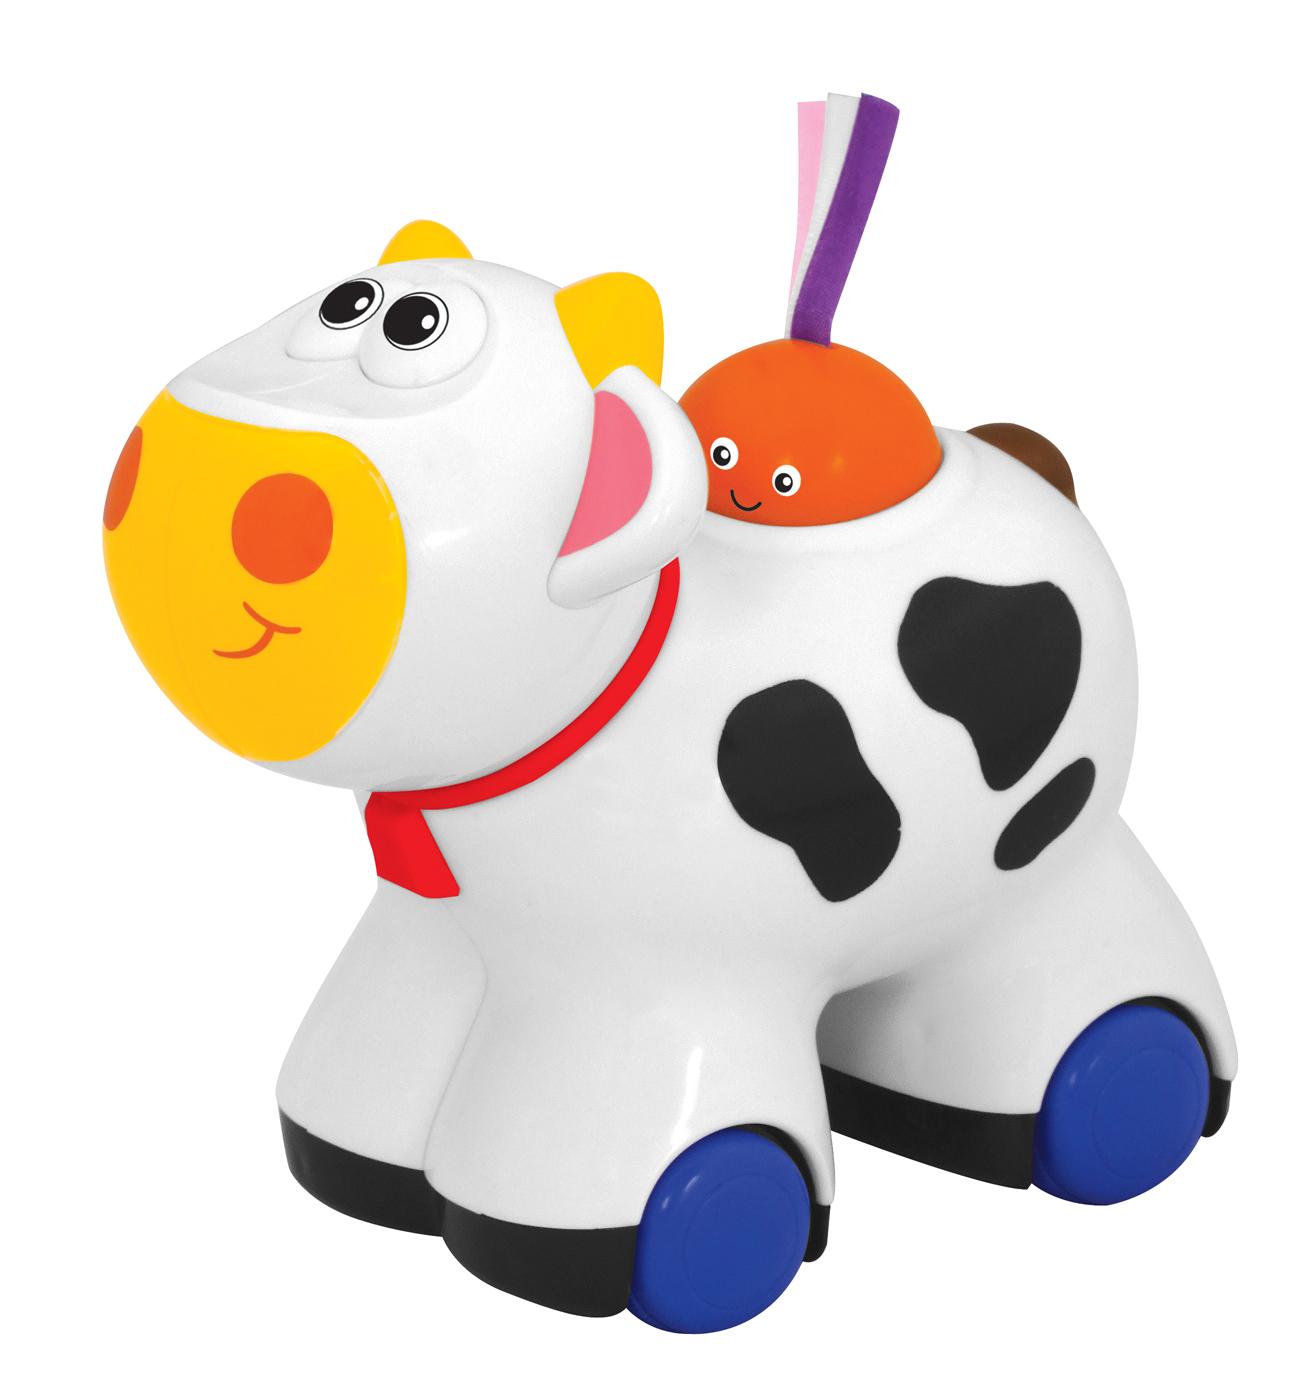 Kiddieland Push N Go Moo Moo Cow